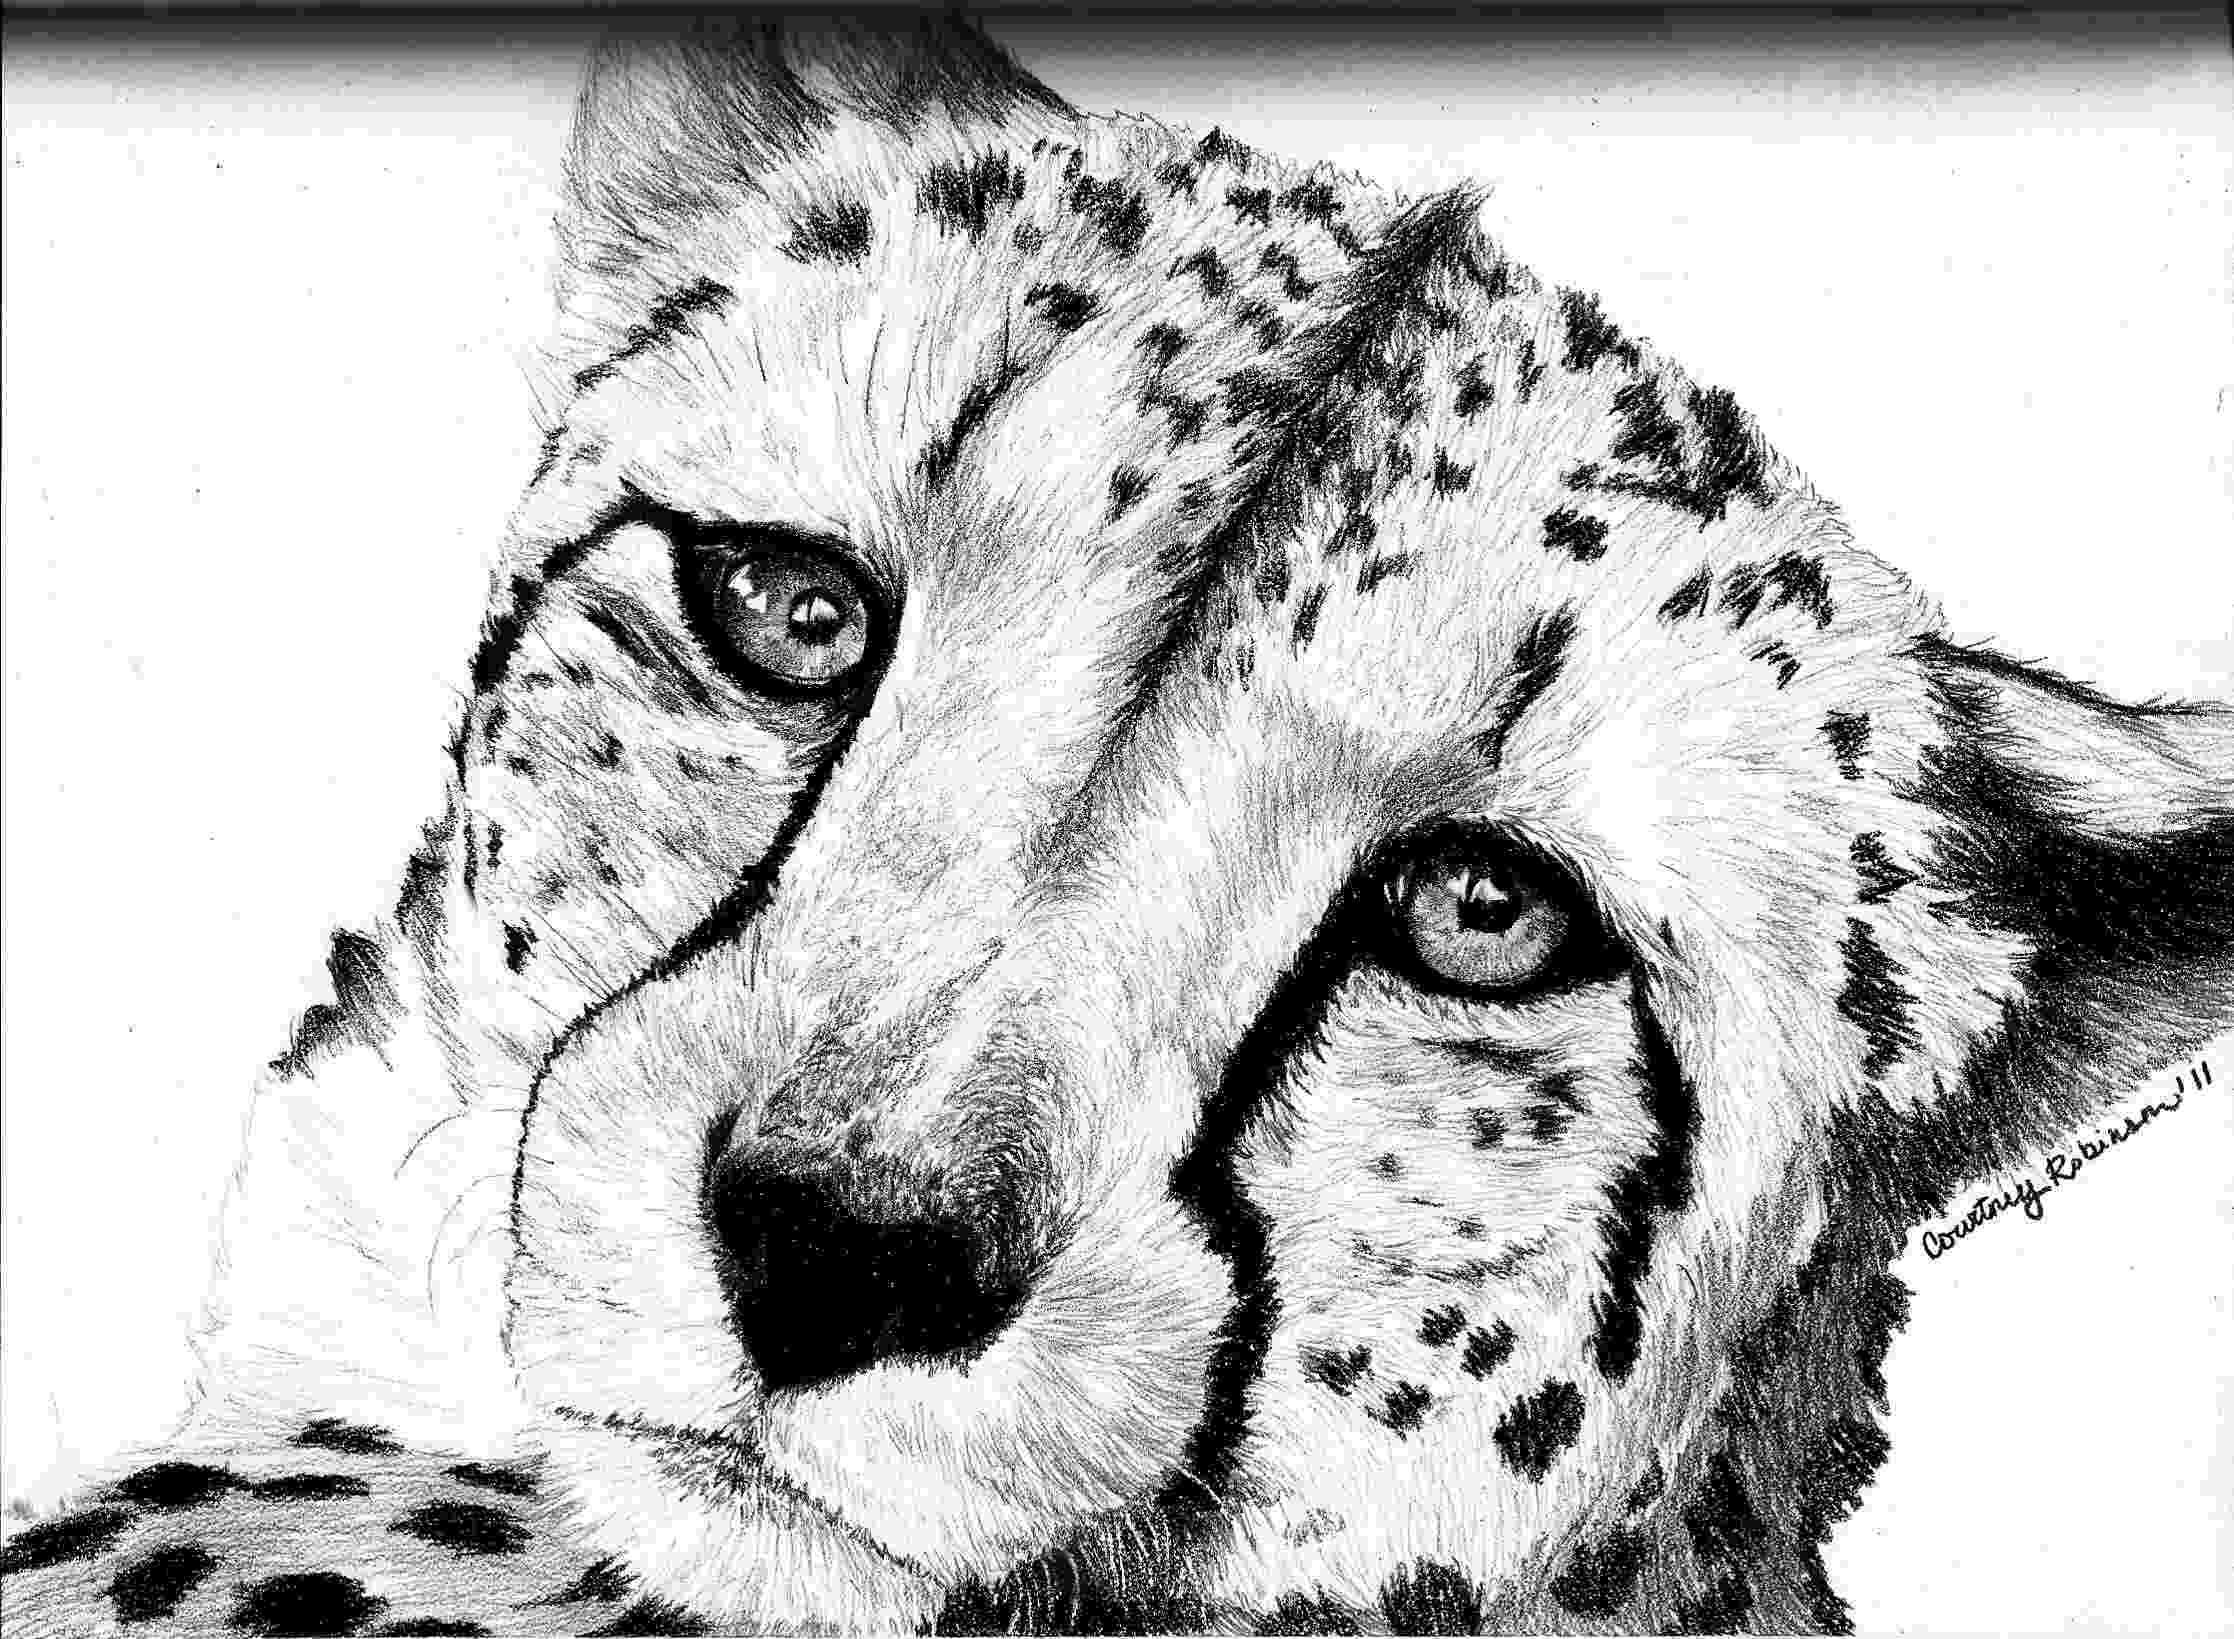 sketch of cheetah how to draw a cheetah drawingforallnet cheetah of sketch